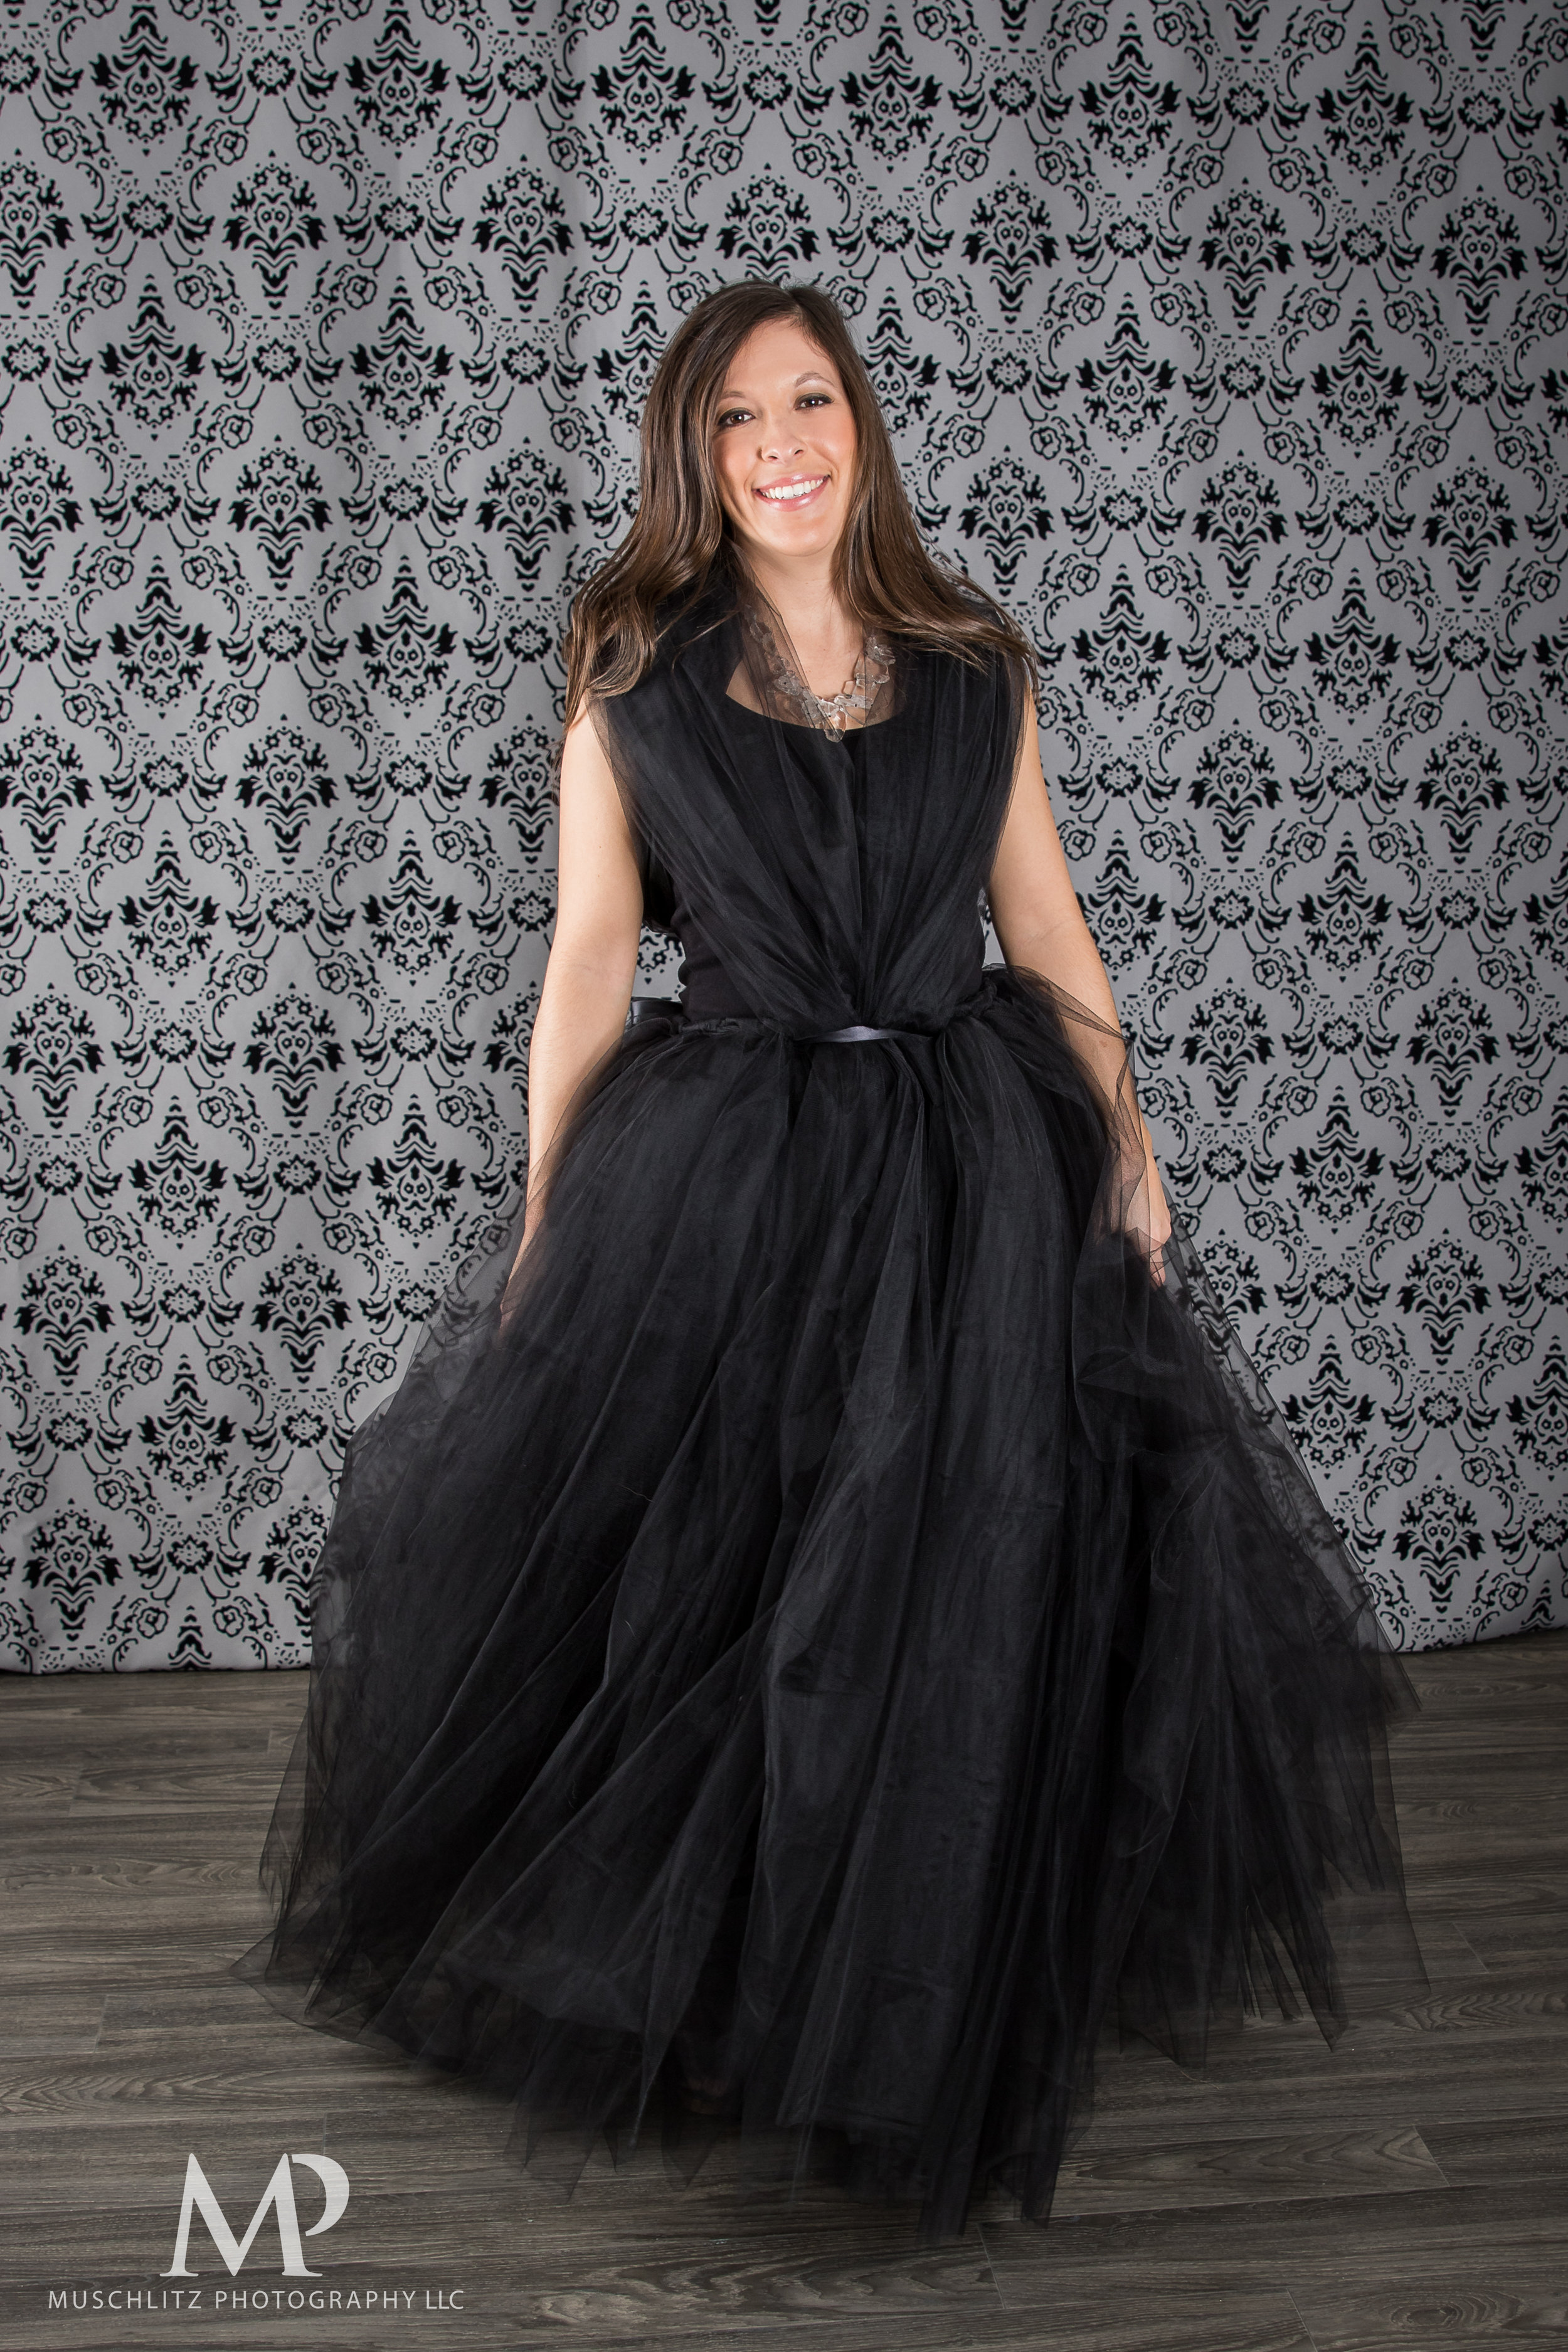 beauty-bridal-glam-the-dress-portraits-photographer-studio-columbus-ohio-gahanna-muschlitz-photography-013.JPG